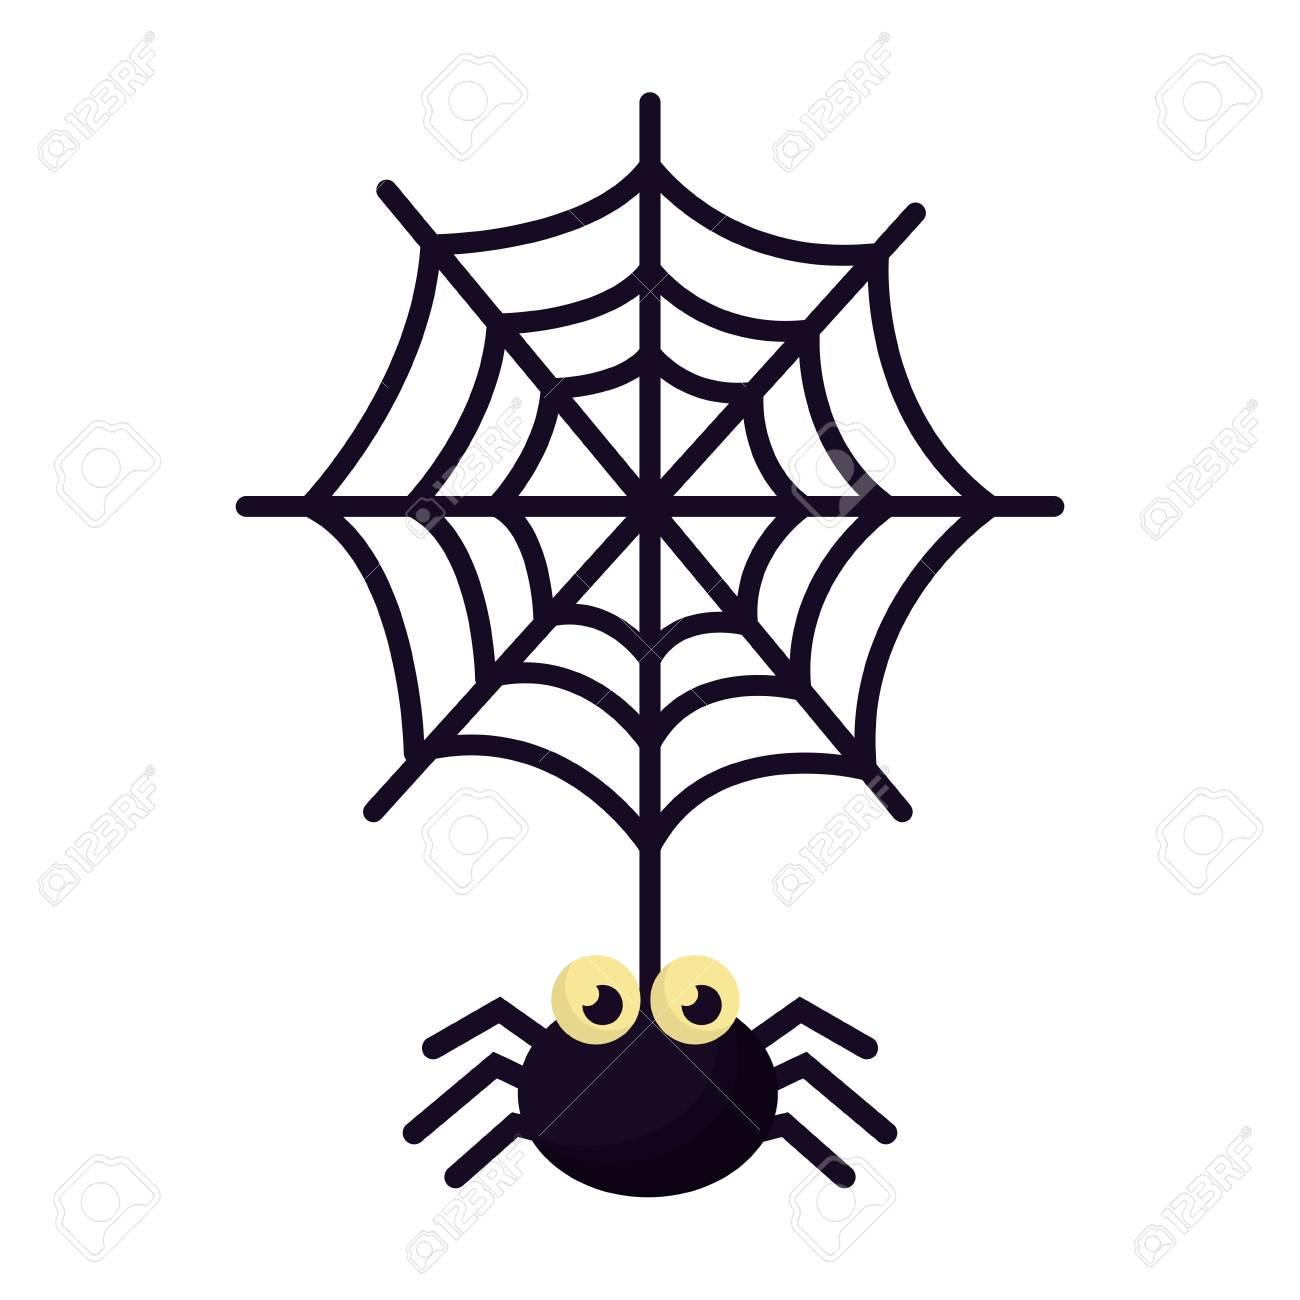 halloween spider with spiderweb isolated icon vector illustration design - 108572529